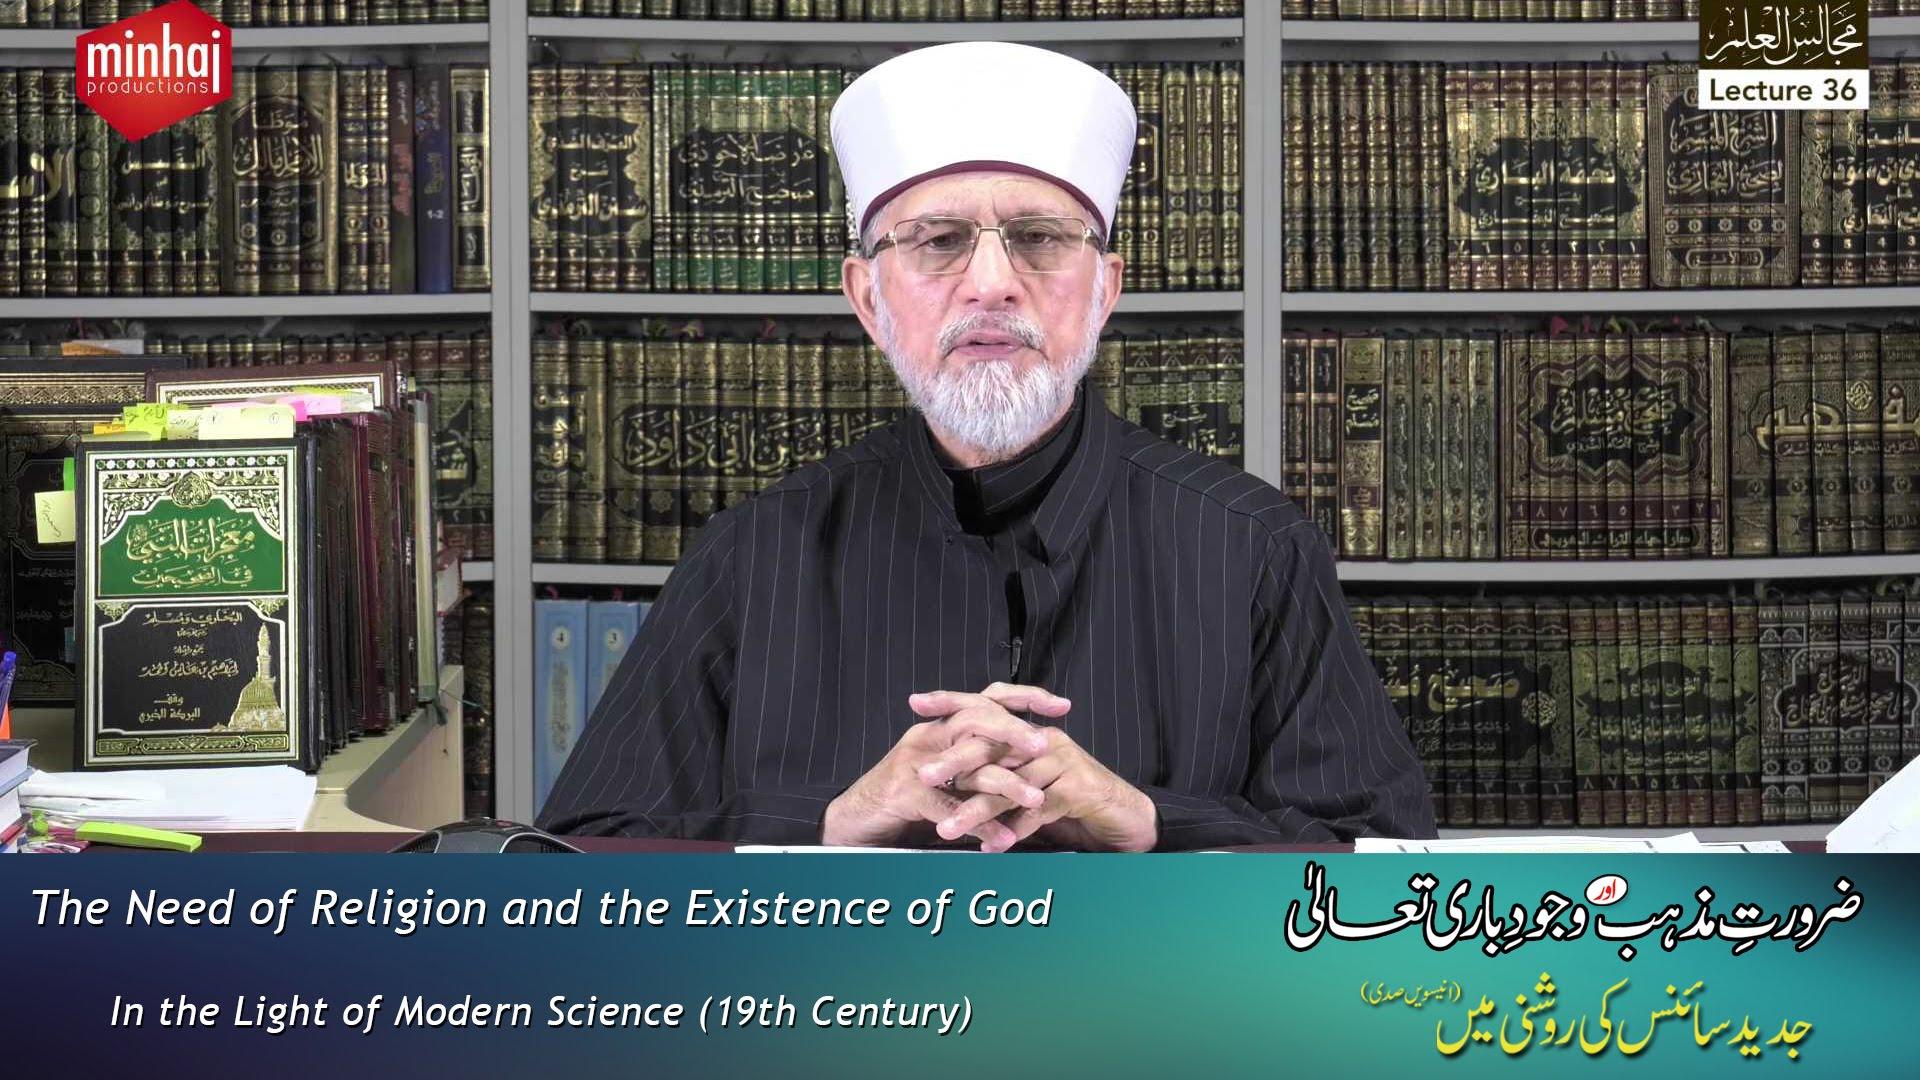 Majalis-ul-ilm (Lecture 36) - by Shaykh-ul-Islam Dr Muhammad Tahir-ul-Qadri